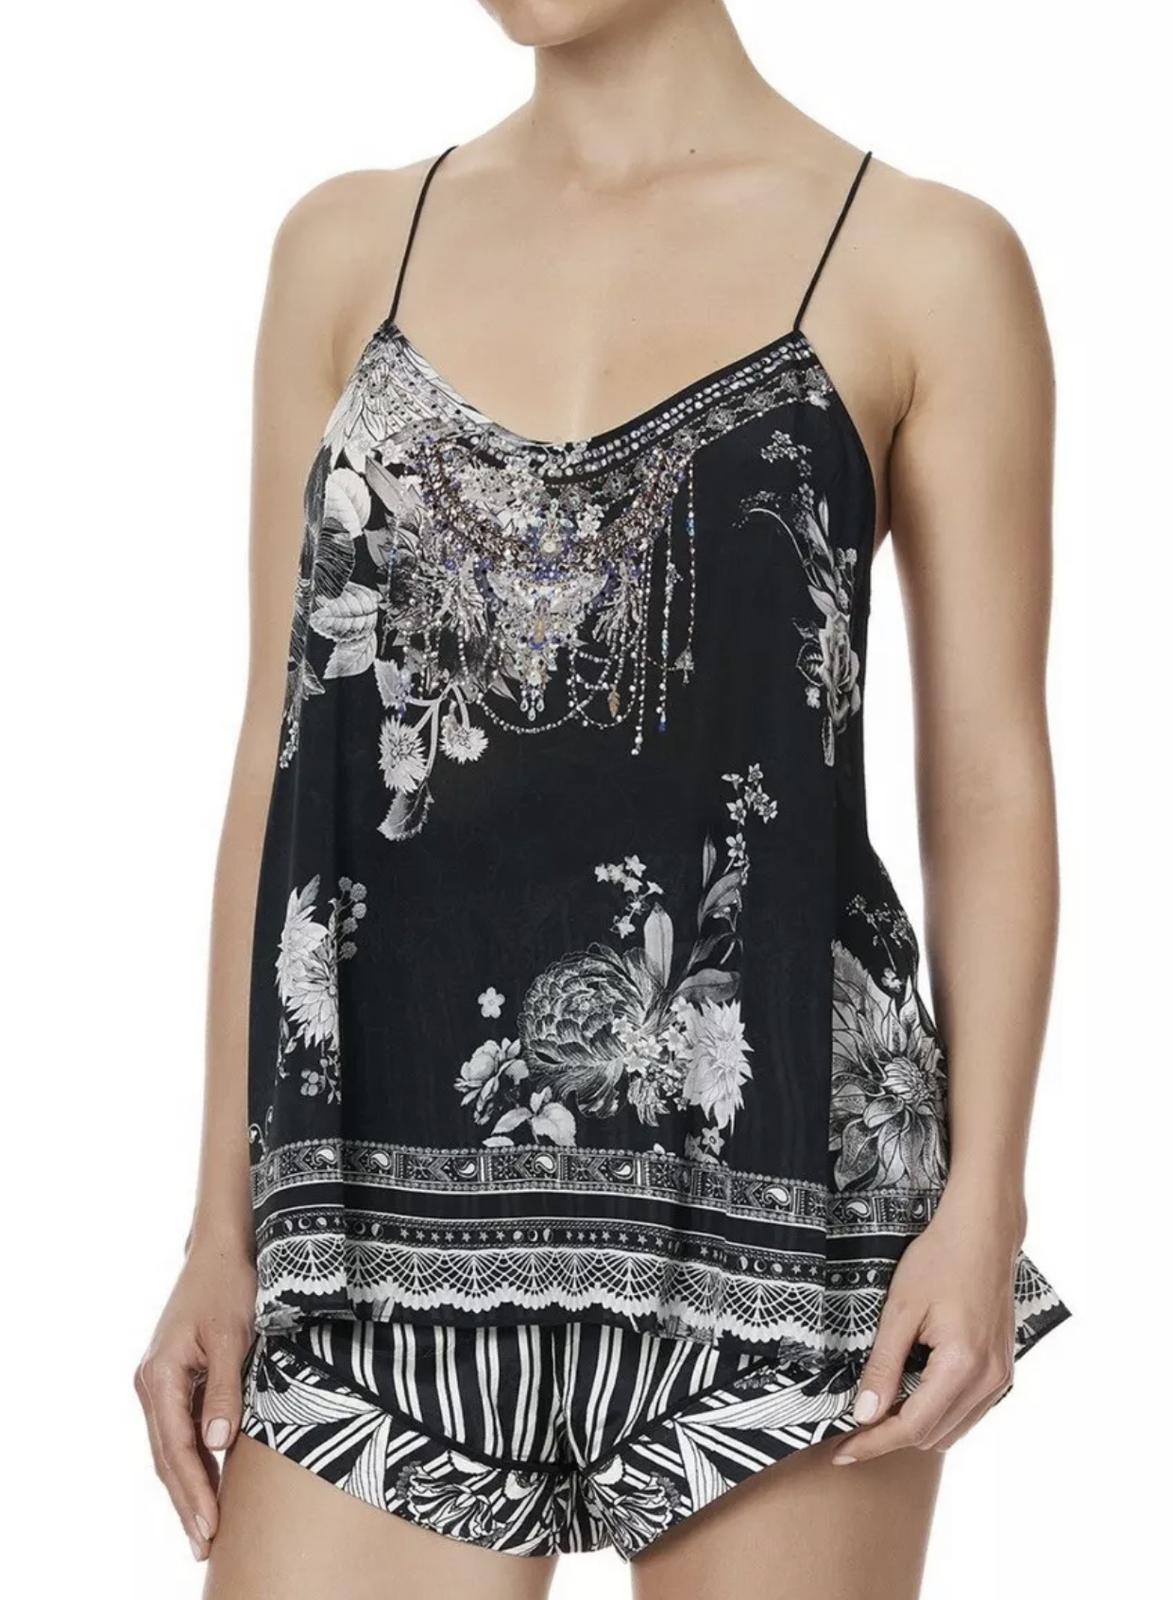 Buy:  'Moonshine bloom' T back Top BNWT Size 14